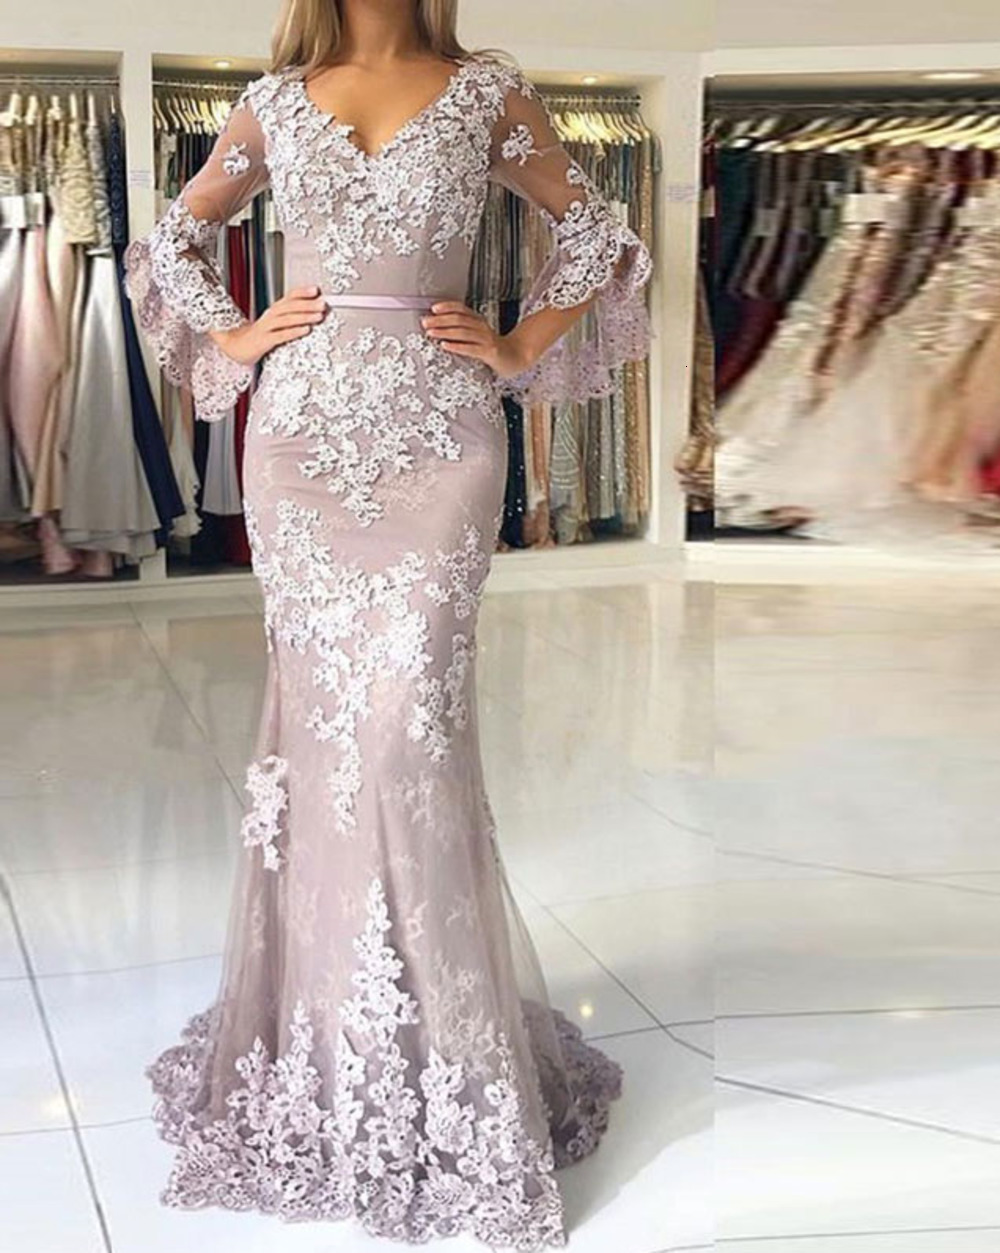 Glamorous V Neck Spaghetti Straps Mermaid Evening Dresses Elegant Lace Appliques Prom Party Dresses Formal Dresses